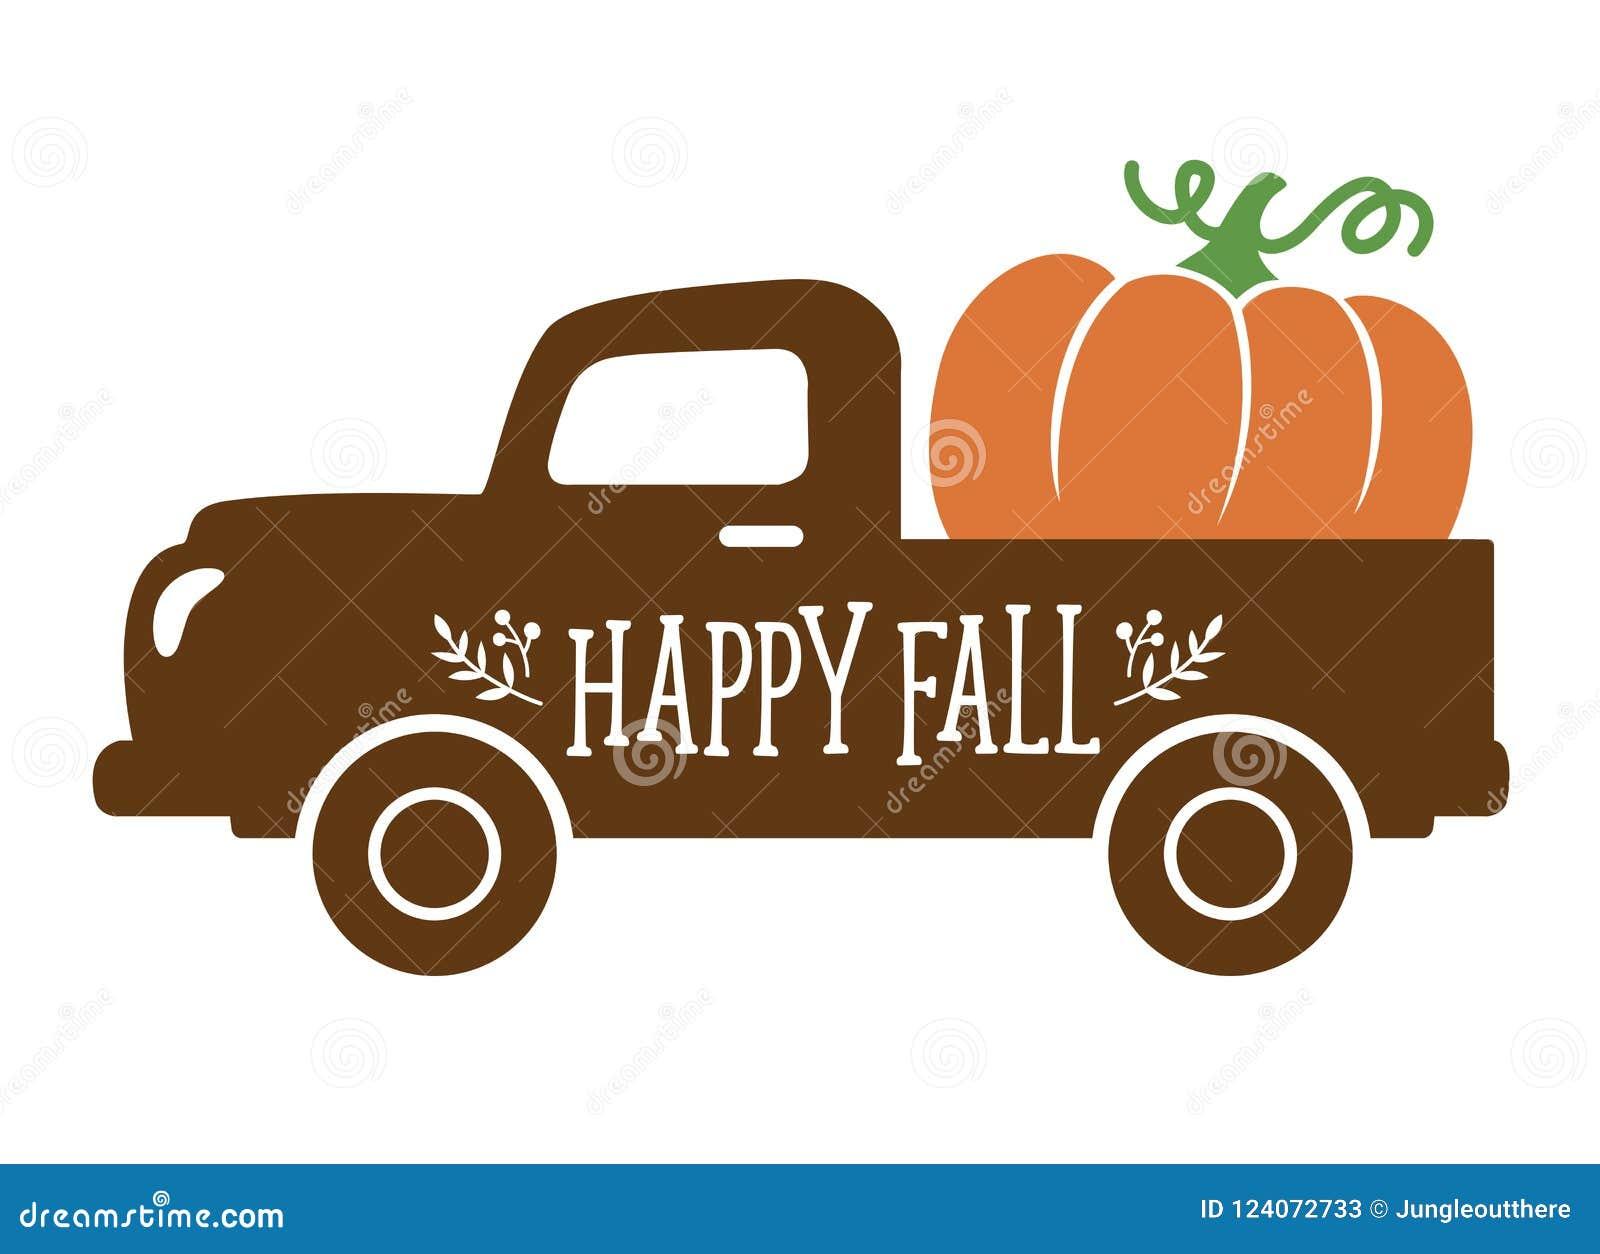 Fall Truck Stock Illustrations 576 Fall Truck Stock Illustrations Vectors Clipart Dreamstime